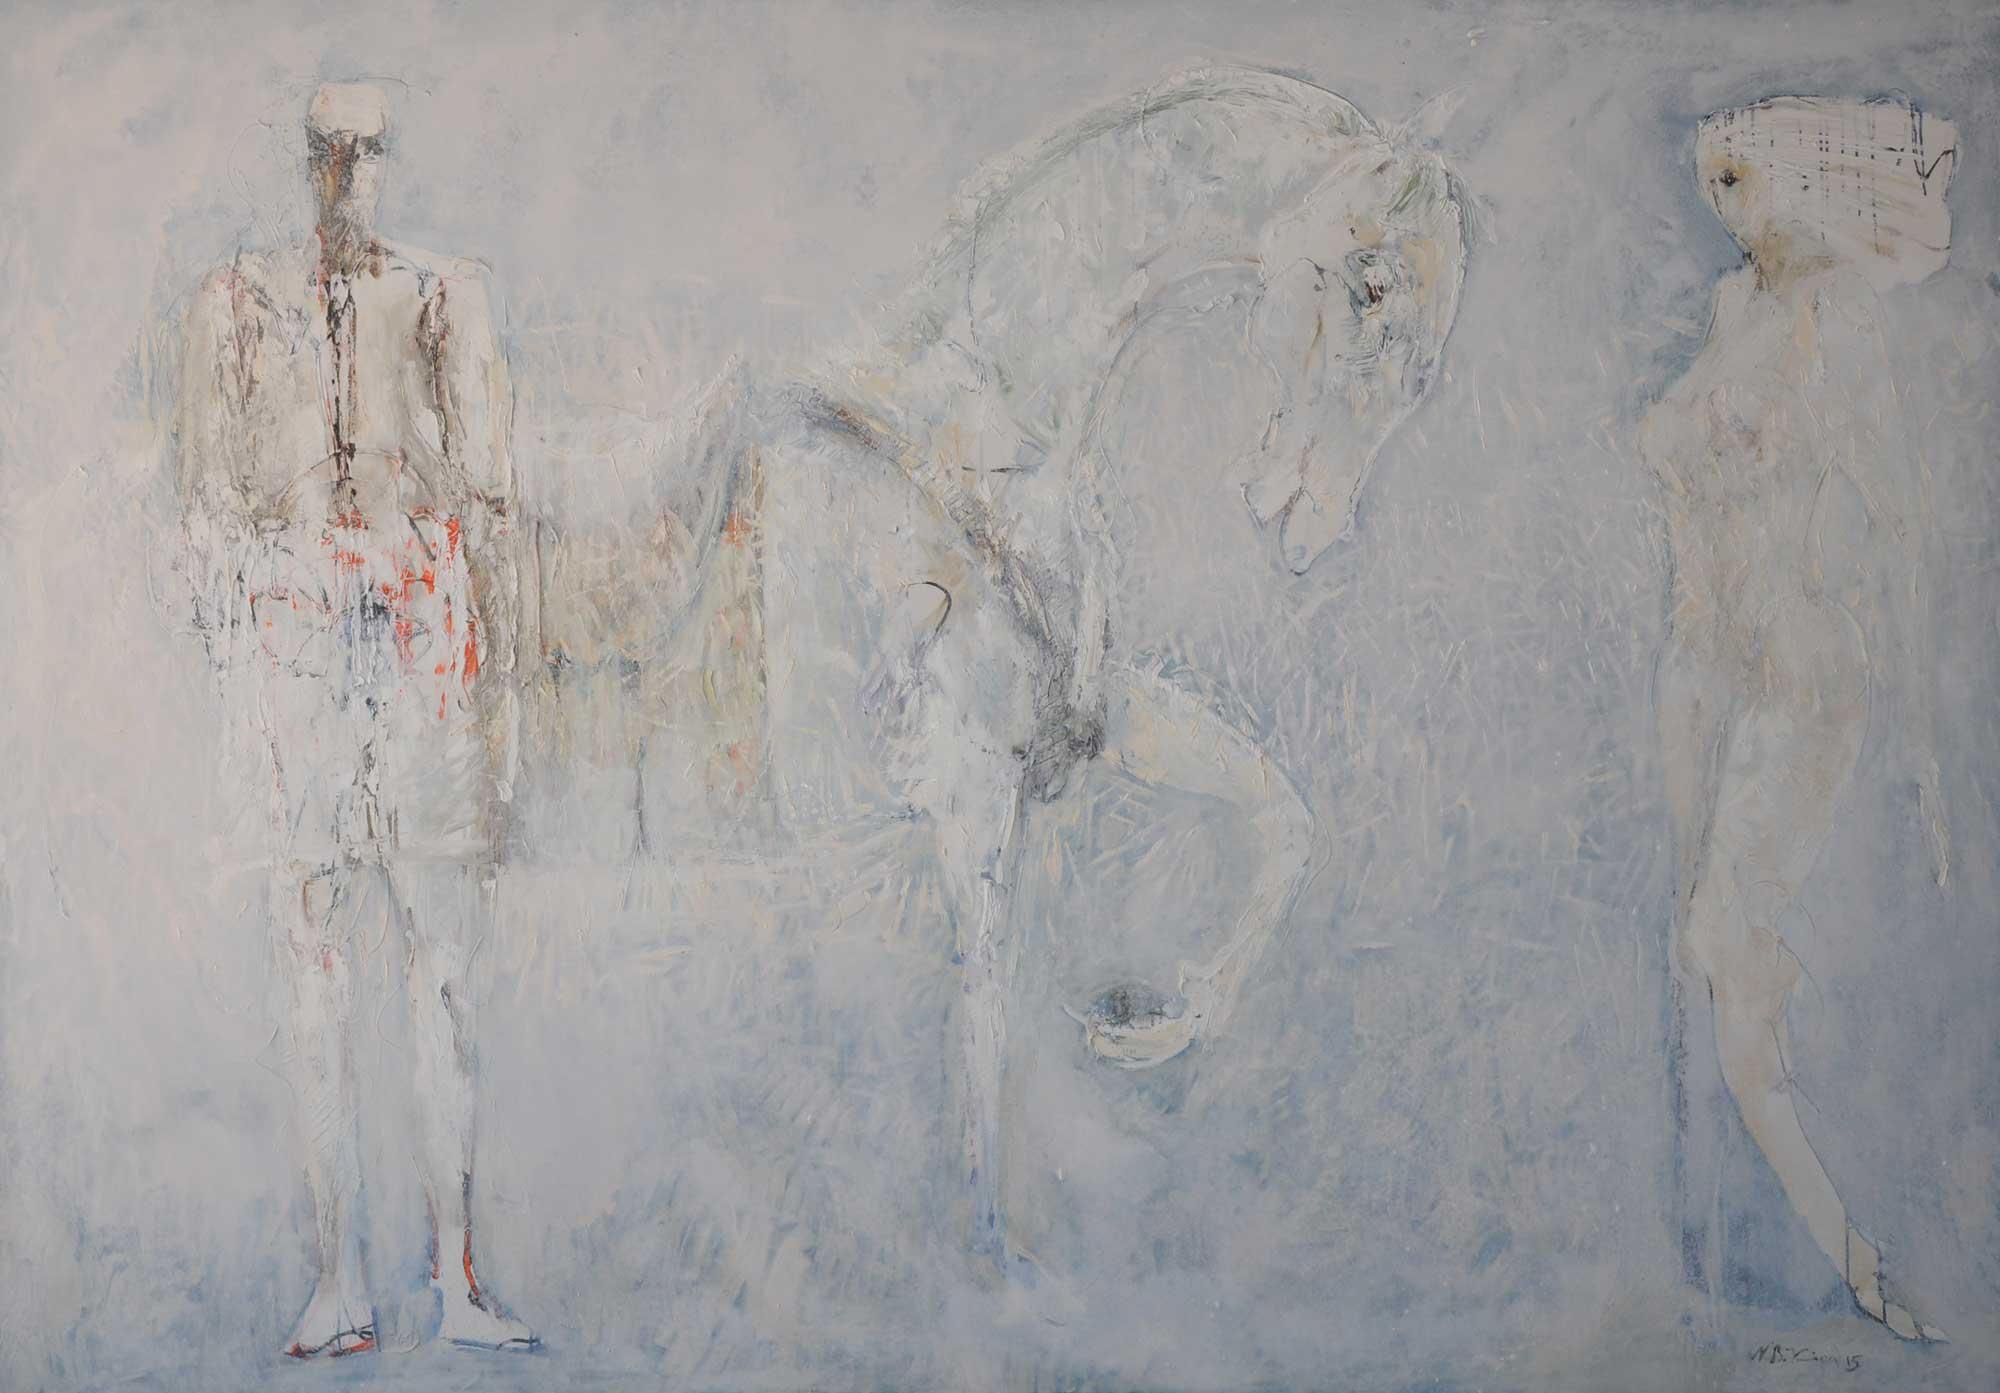 Nevzat Bejtuli KICA, Sudden Meeting, 2015, oil on canvas, 195 x 285 cm